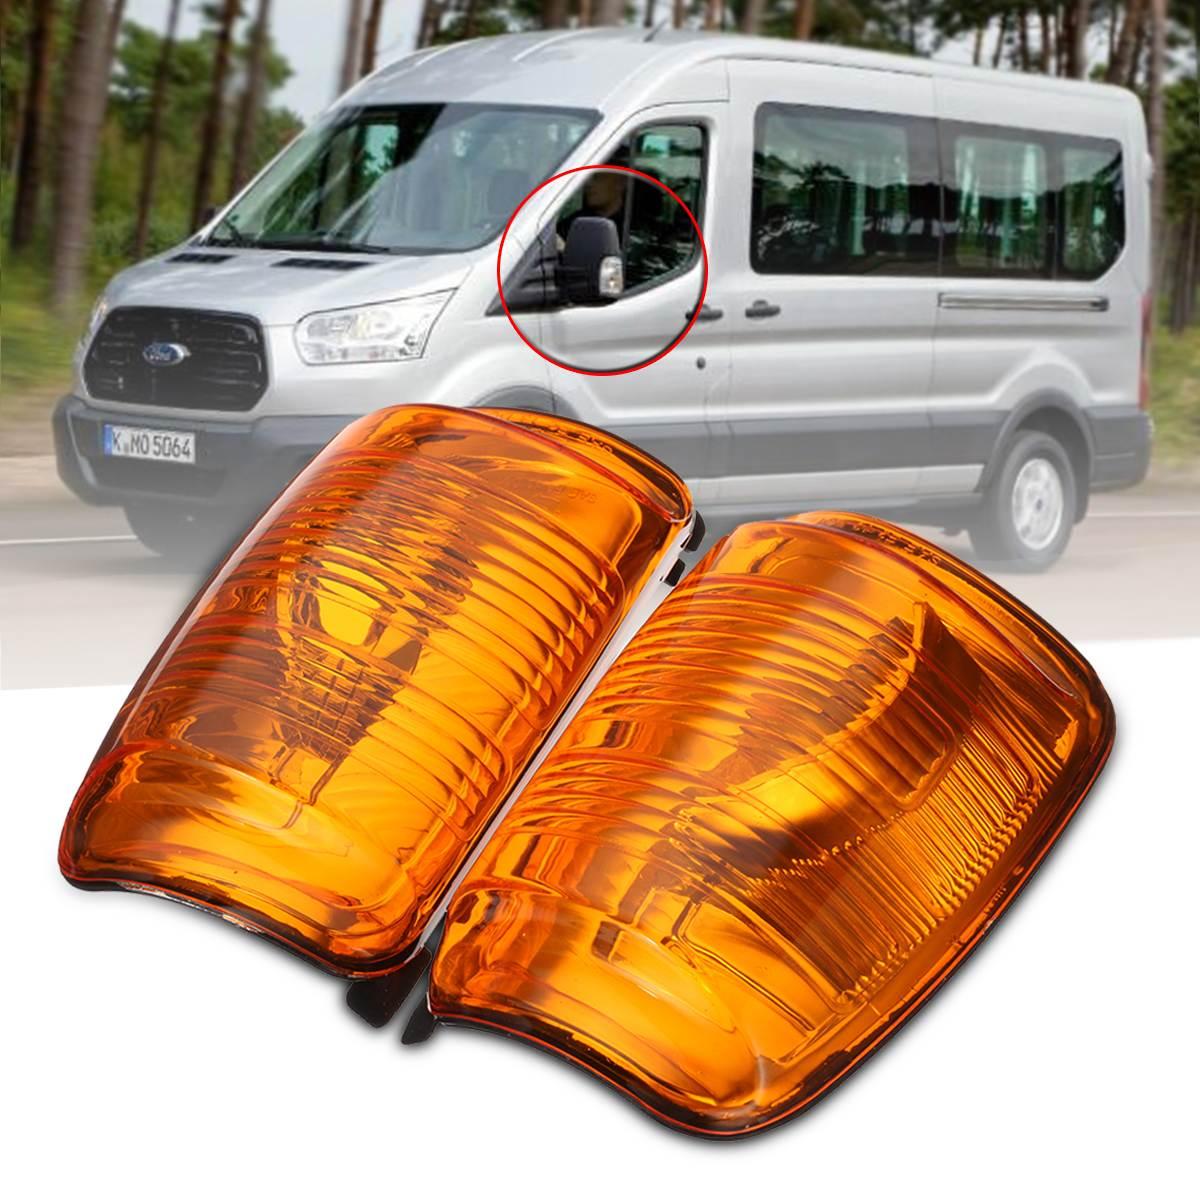 Car Door Wing Mirror Indicator Lens Right Left Side Passenger 1847389 For Ford Transit MK8 2014 Onwards